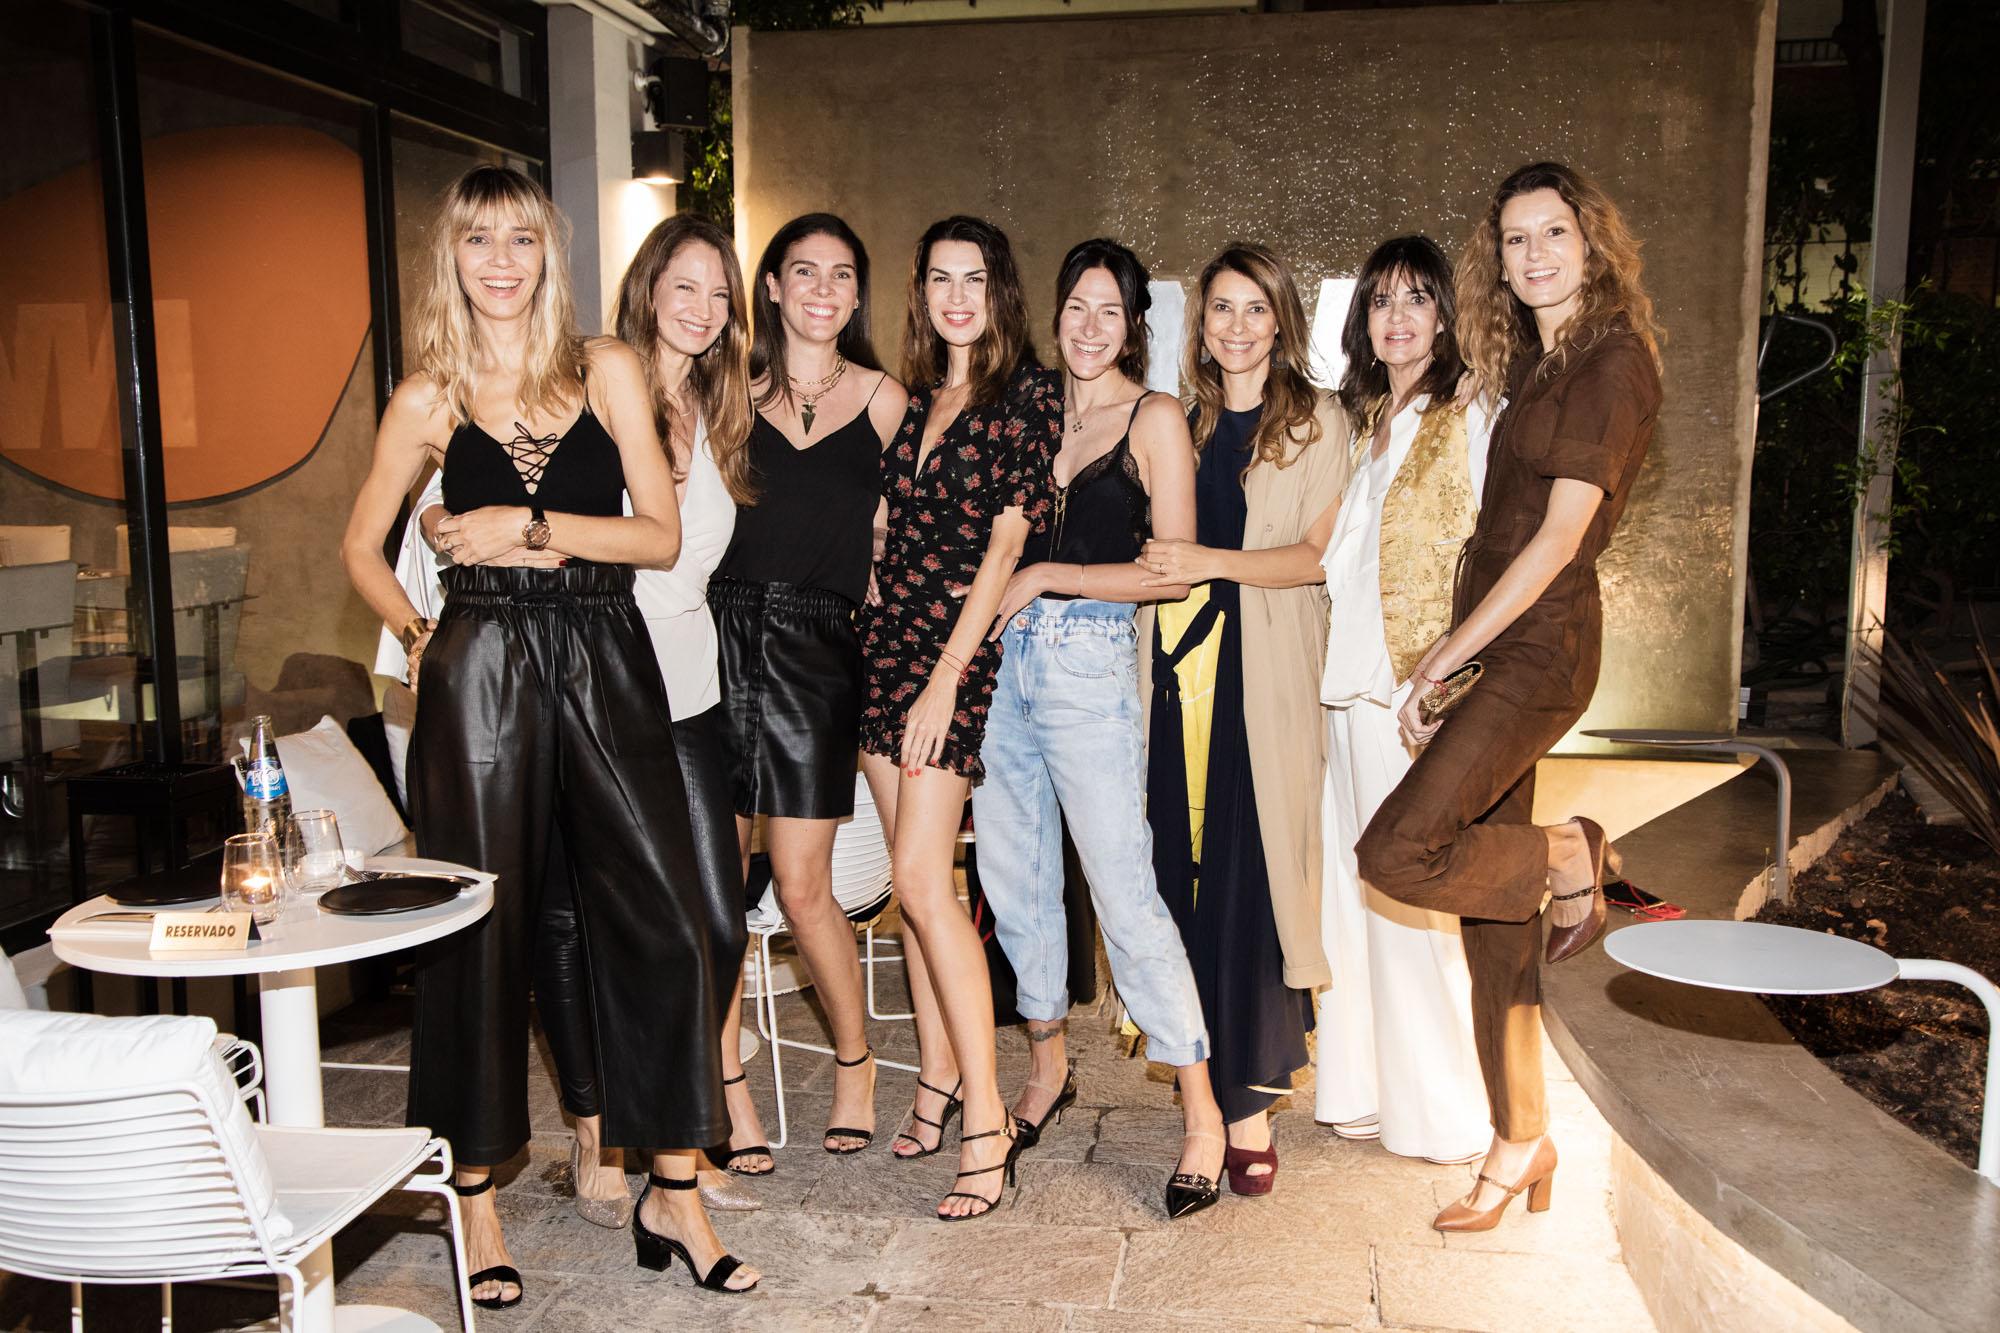 Lorena Ceriscioli, Roxana Zarecki, Solange Cubillo, Dolores Trull, Adriana Batan de Rocca, Isabel Aninat y Catalina Swinburn